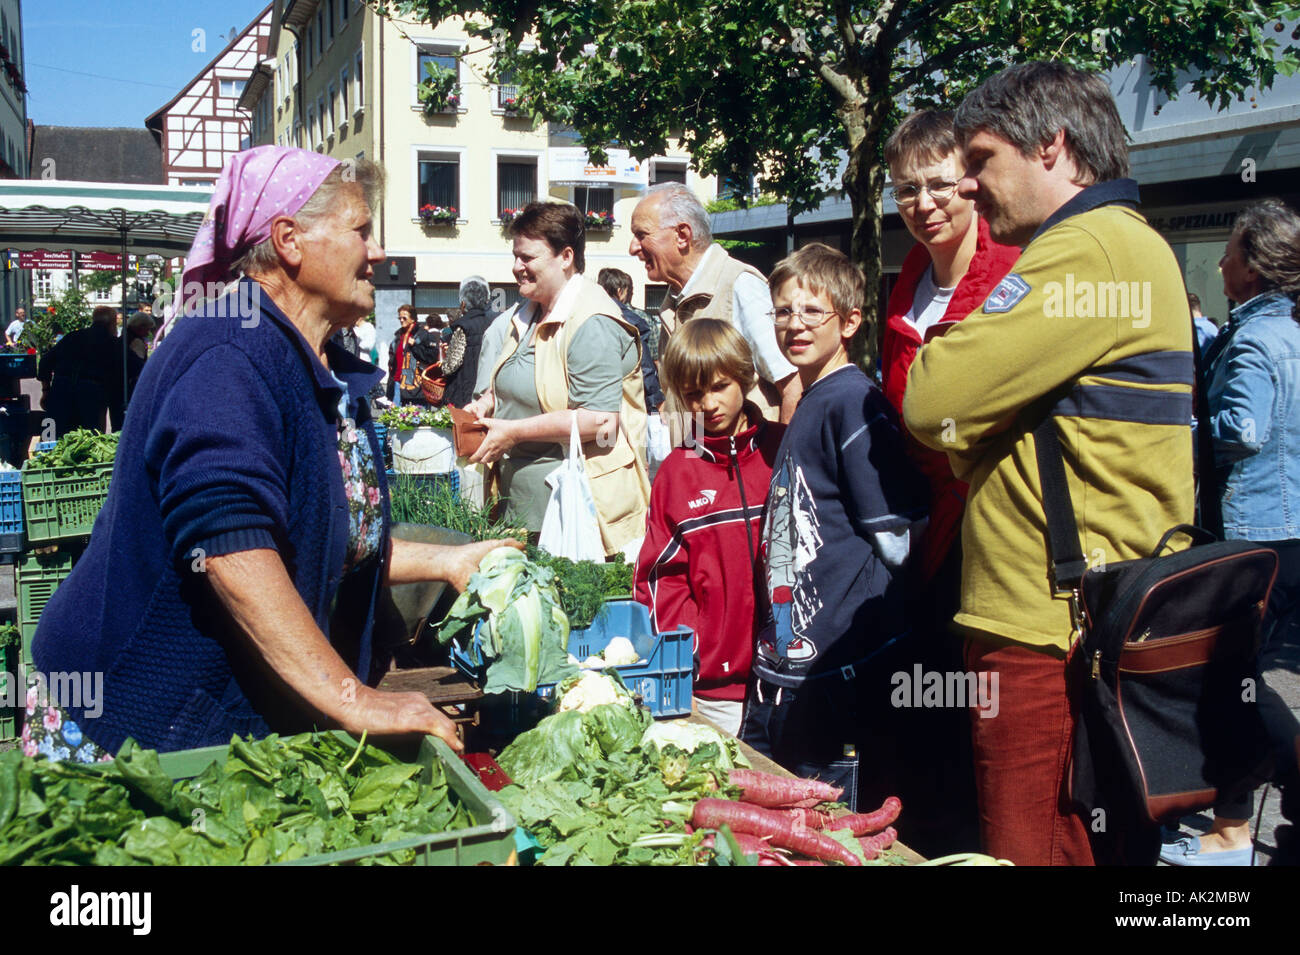 Markt radolfzell